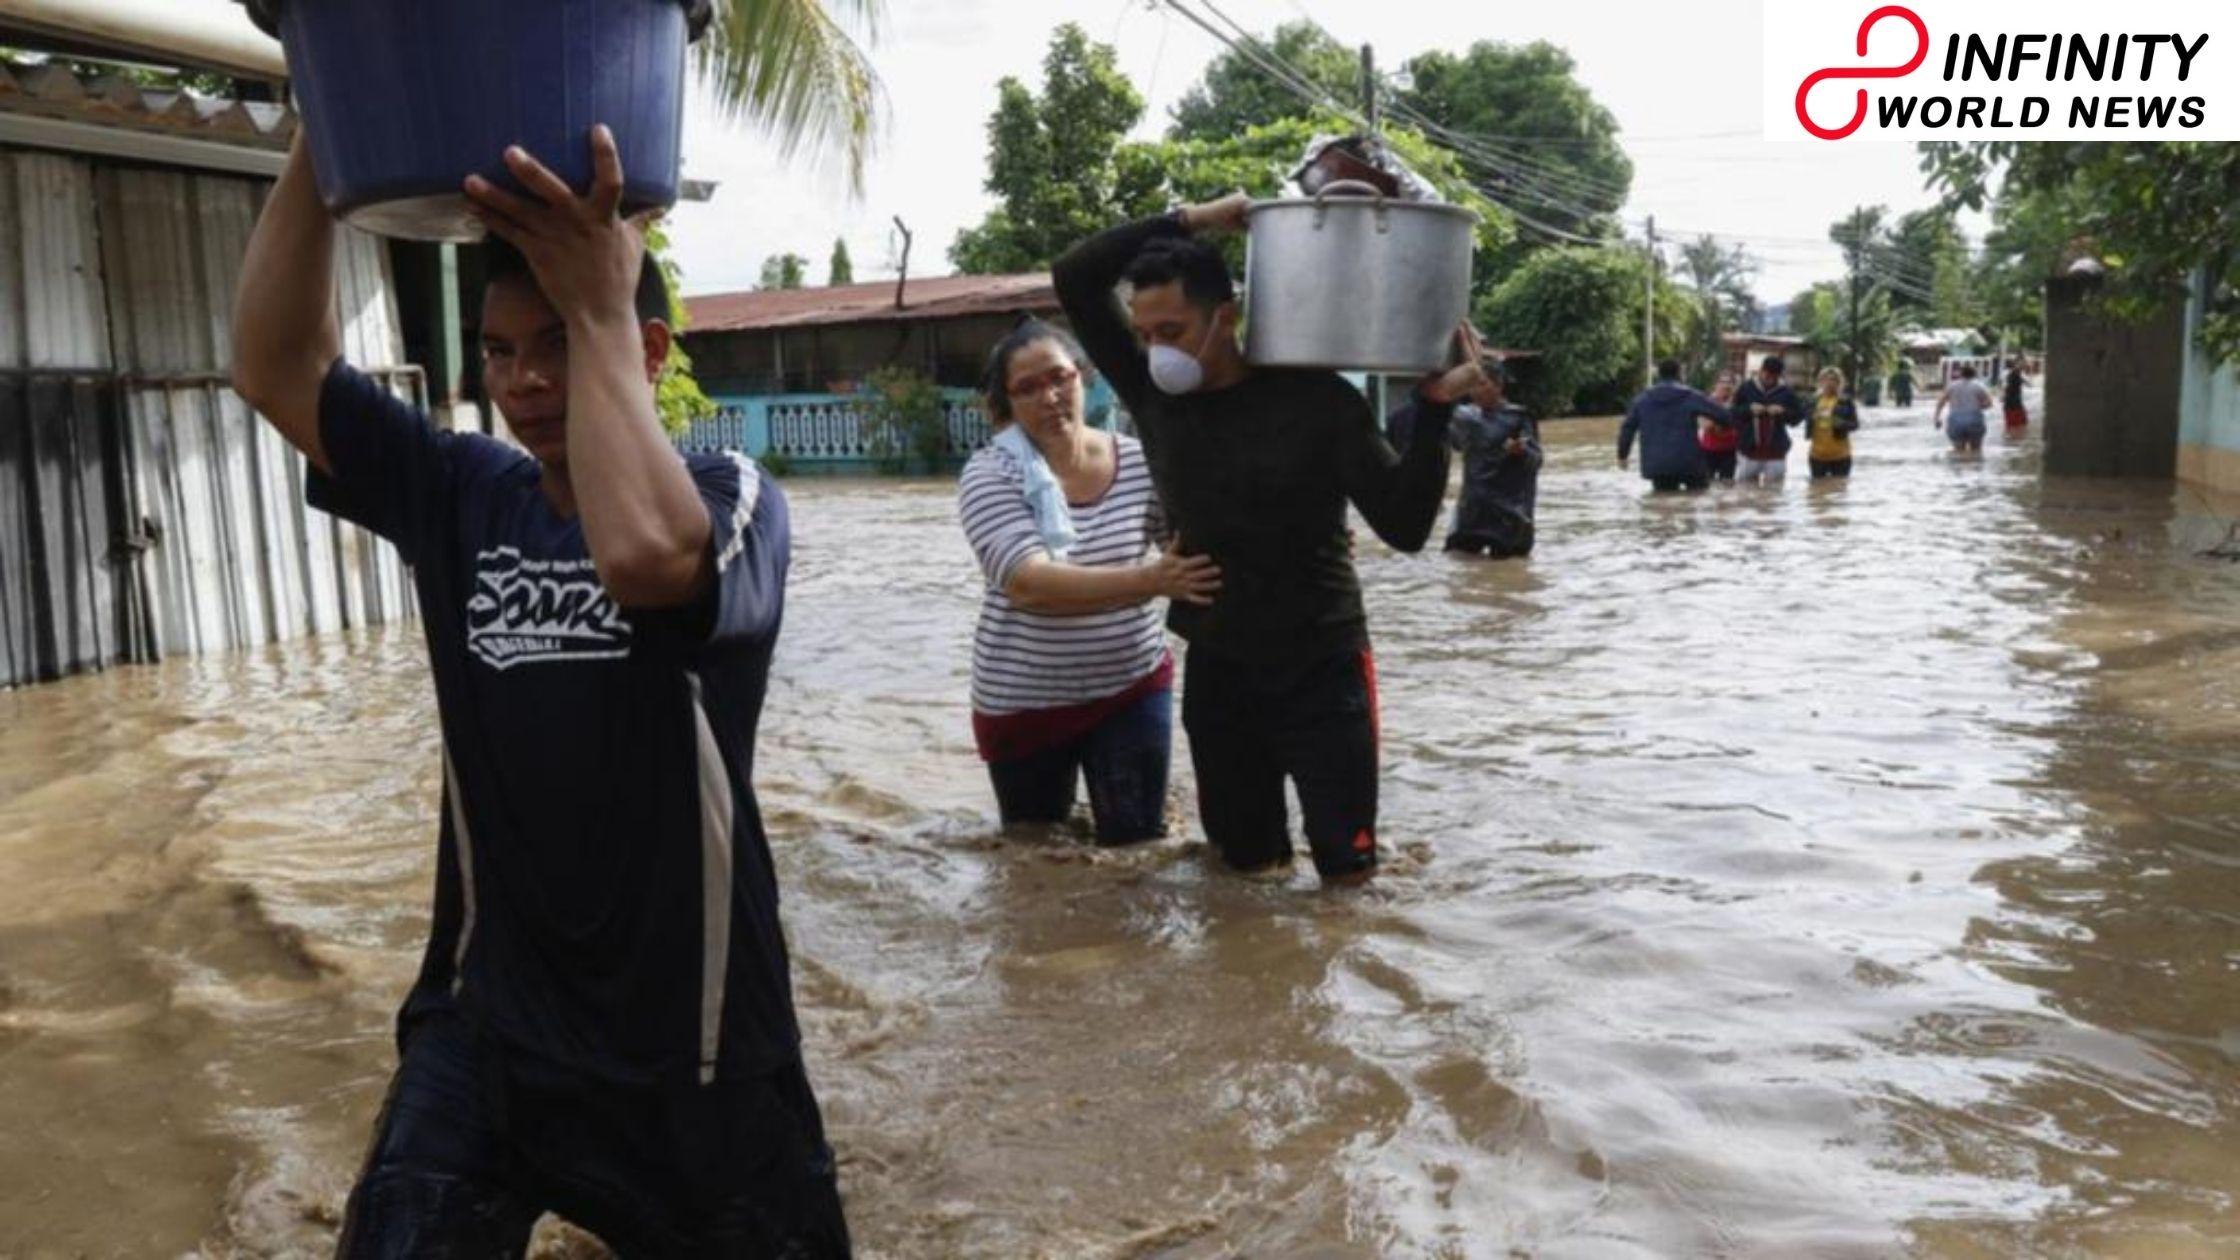 Hurricane Iota structures could follow Etas fatal way